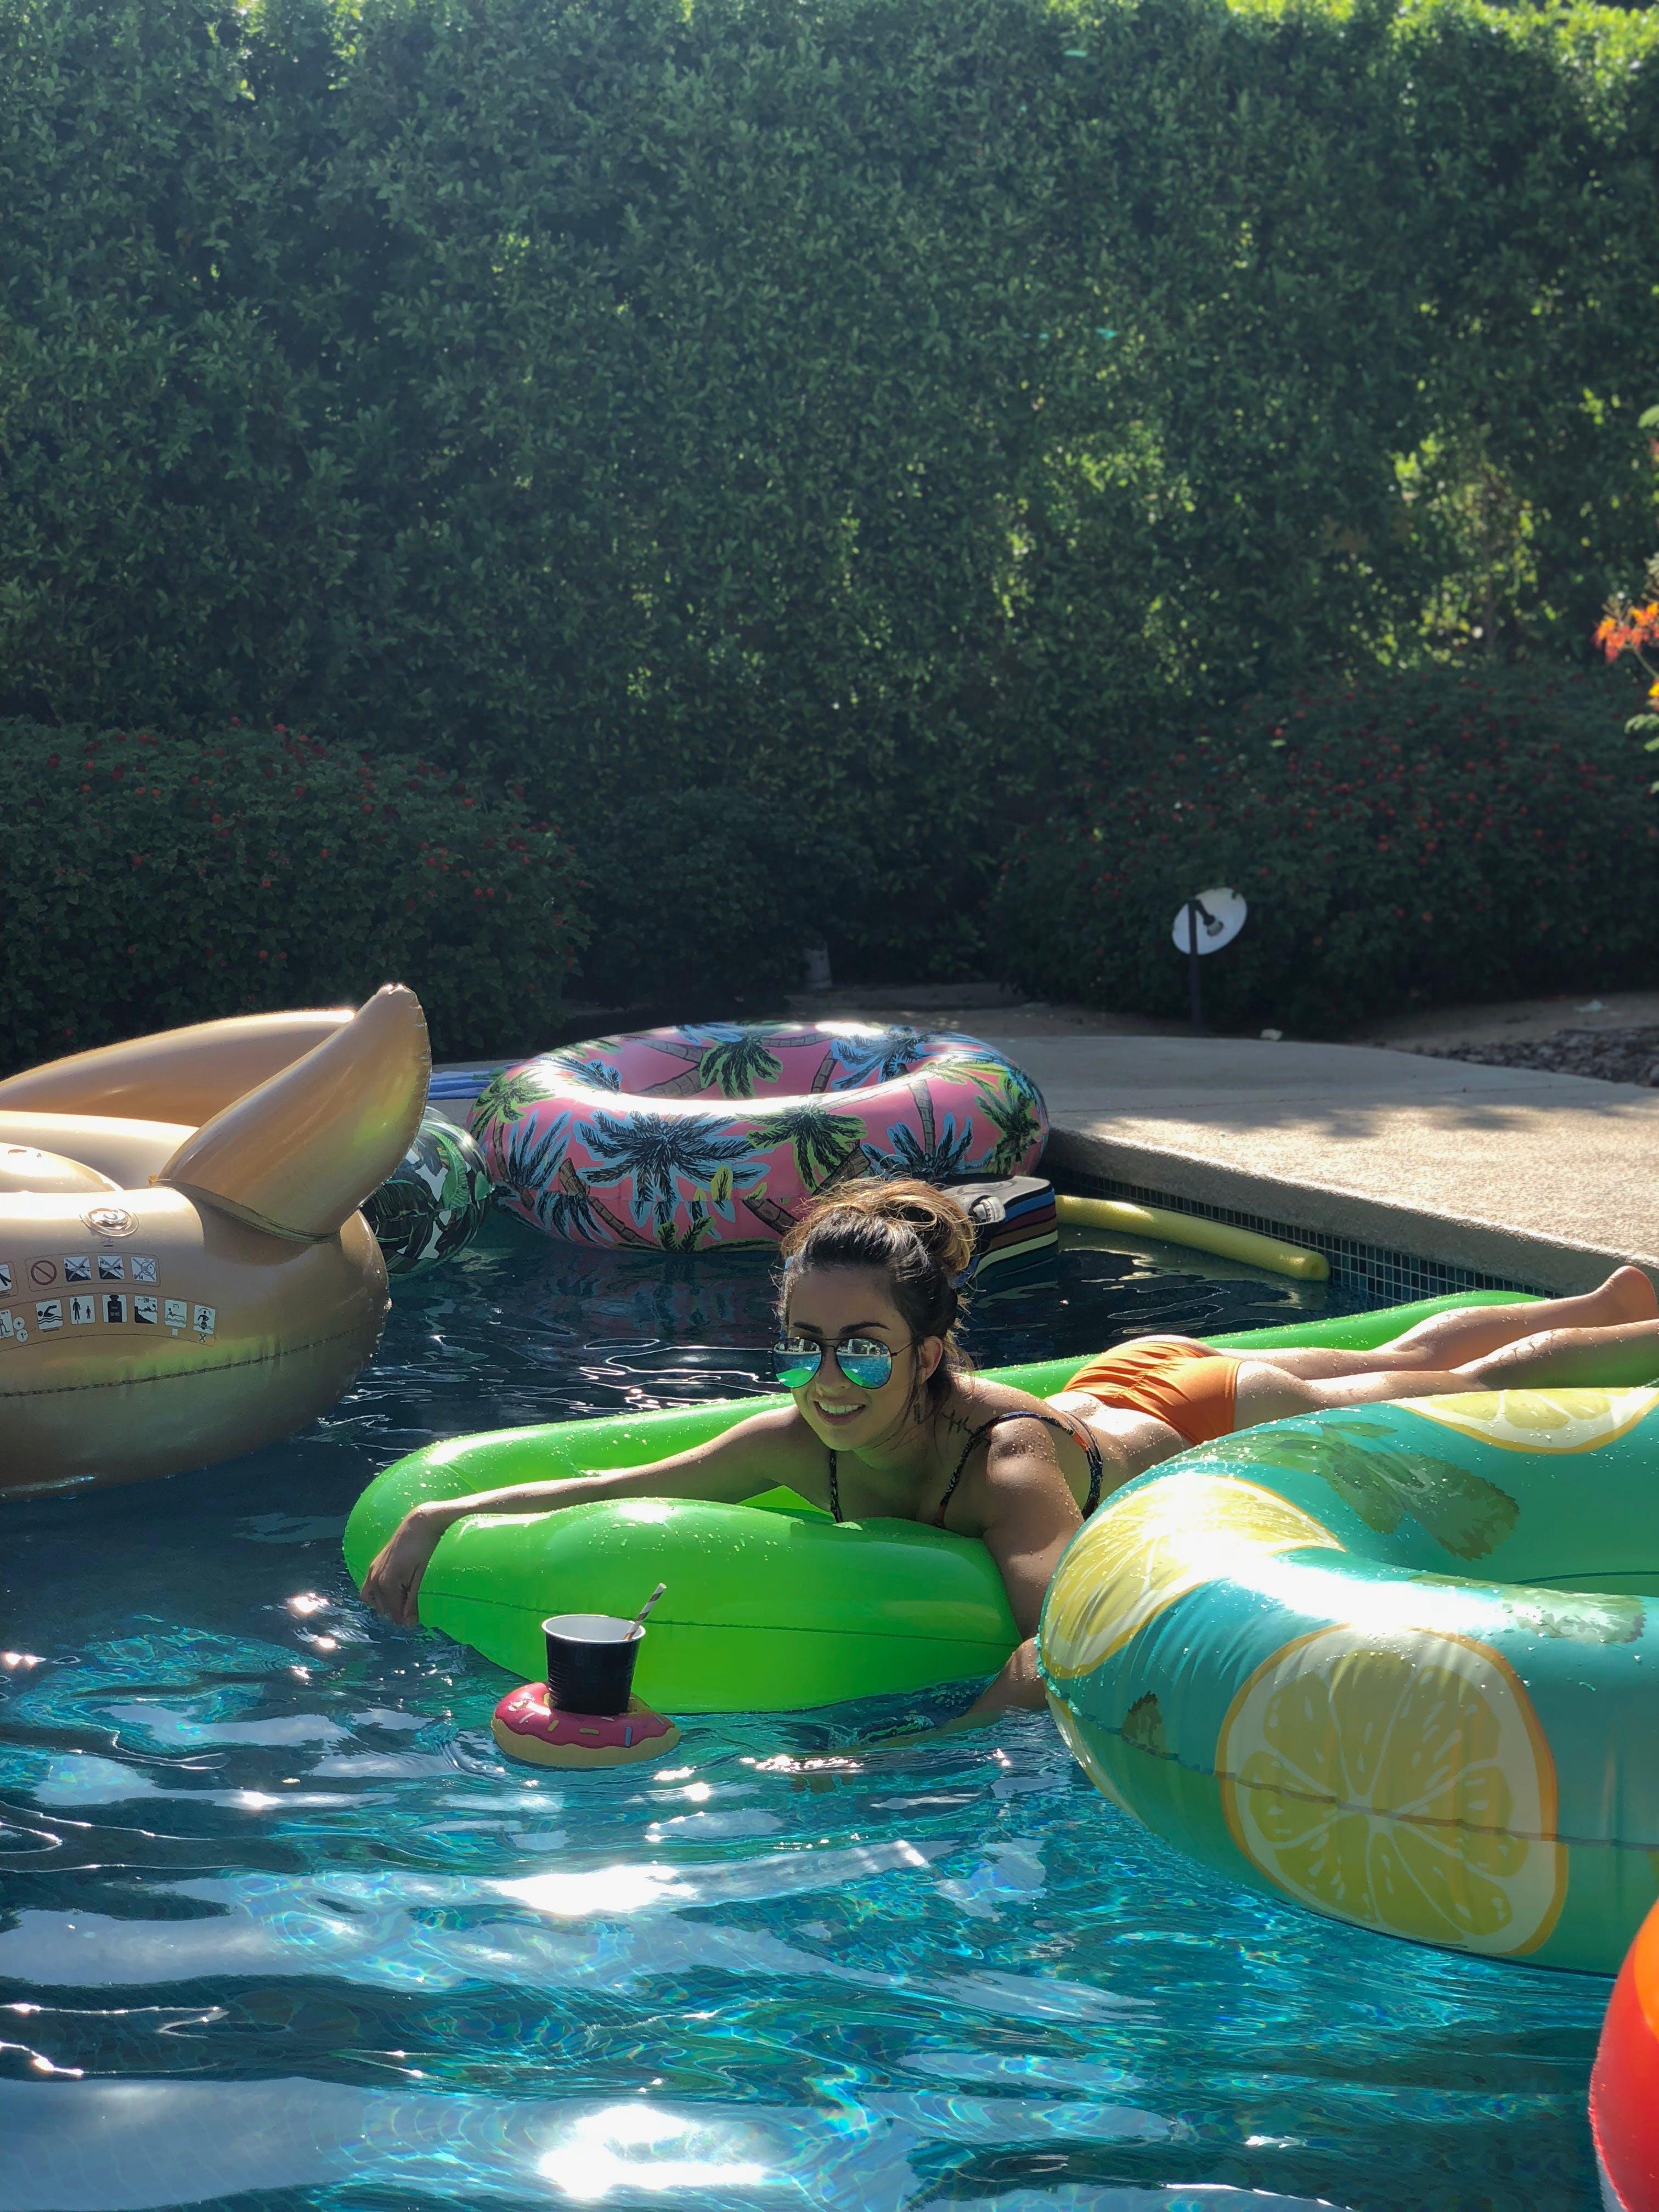 Woman Wearing Orange Bikini Lying on Green Inflatable Bed Inside Pool a Day